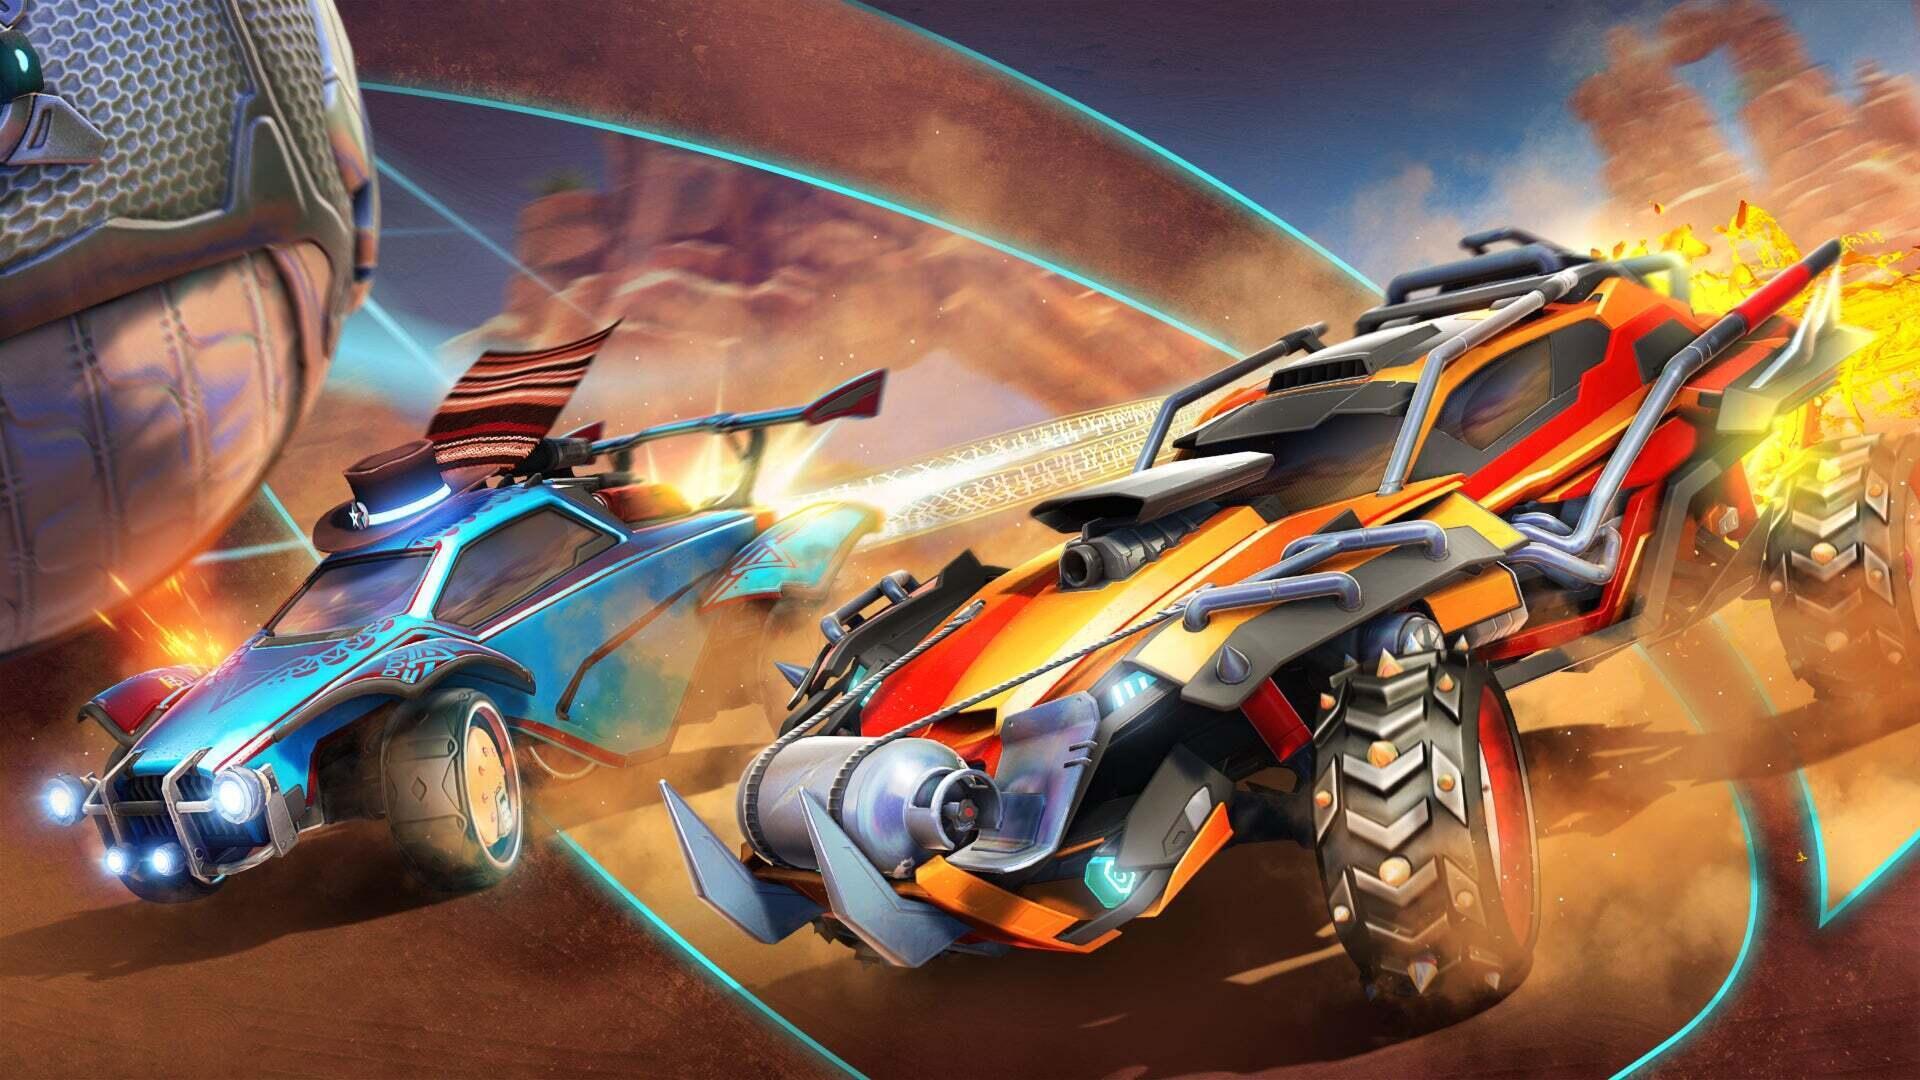 A promotional image for Rocket League Season 4